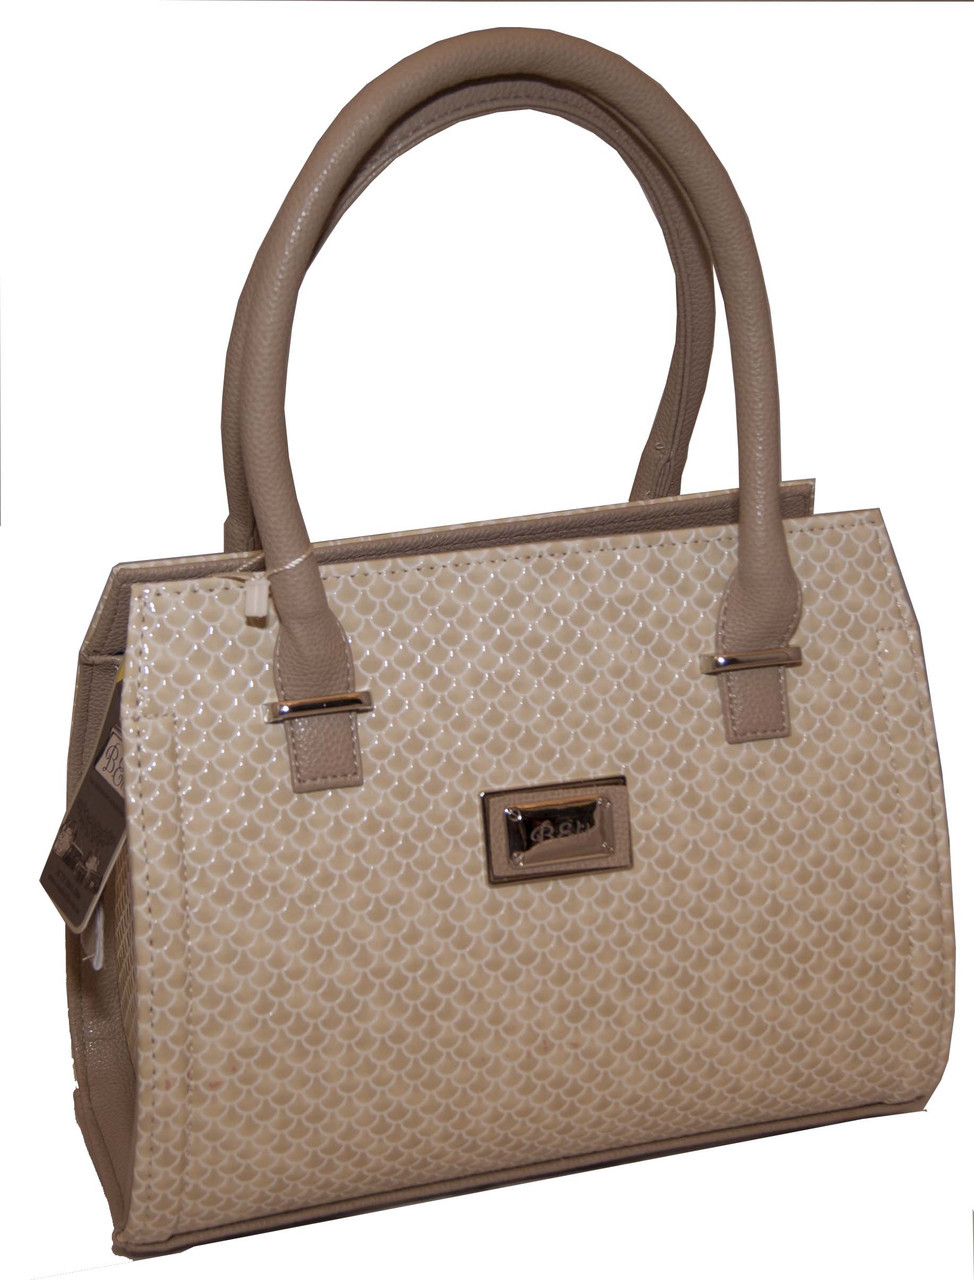 a66e05e49c22 Бежевая каркасная женская сумка B.Elit с текстурой рептилии -  Интернет-магазин